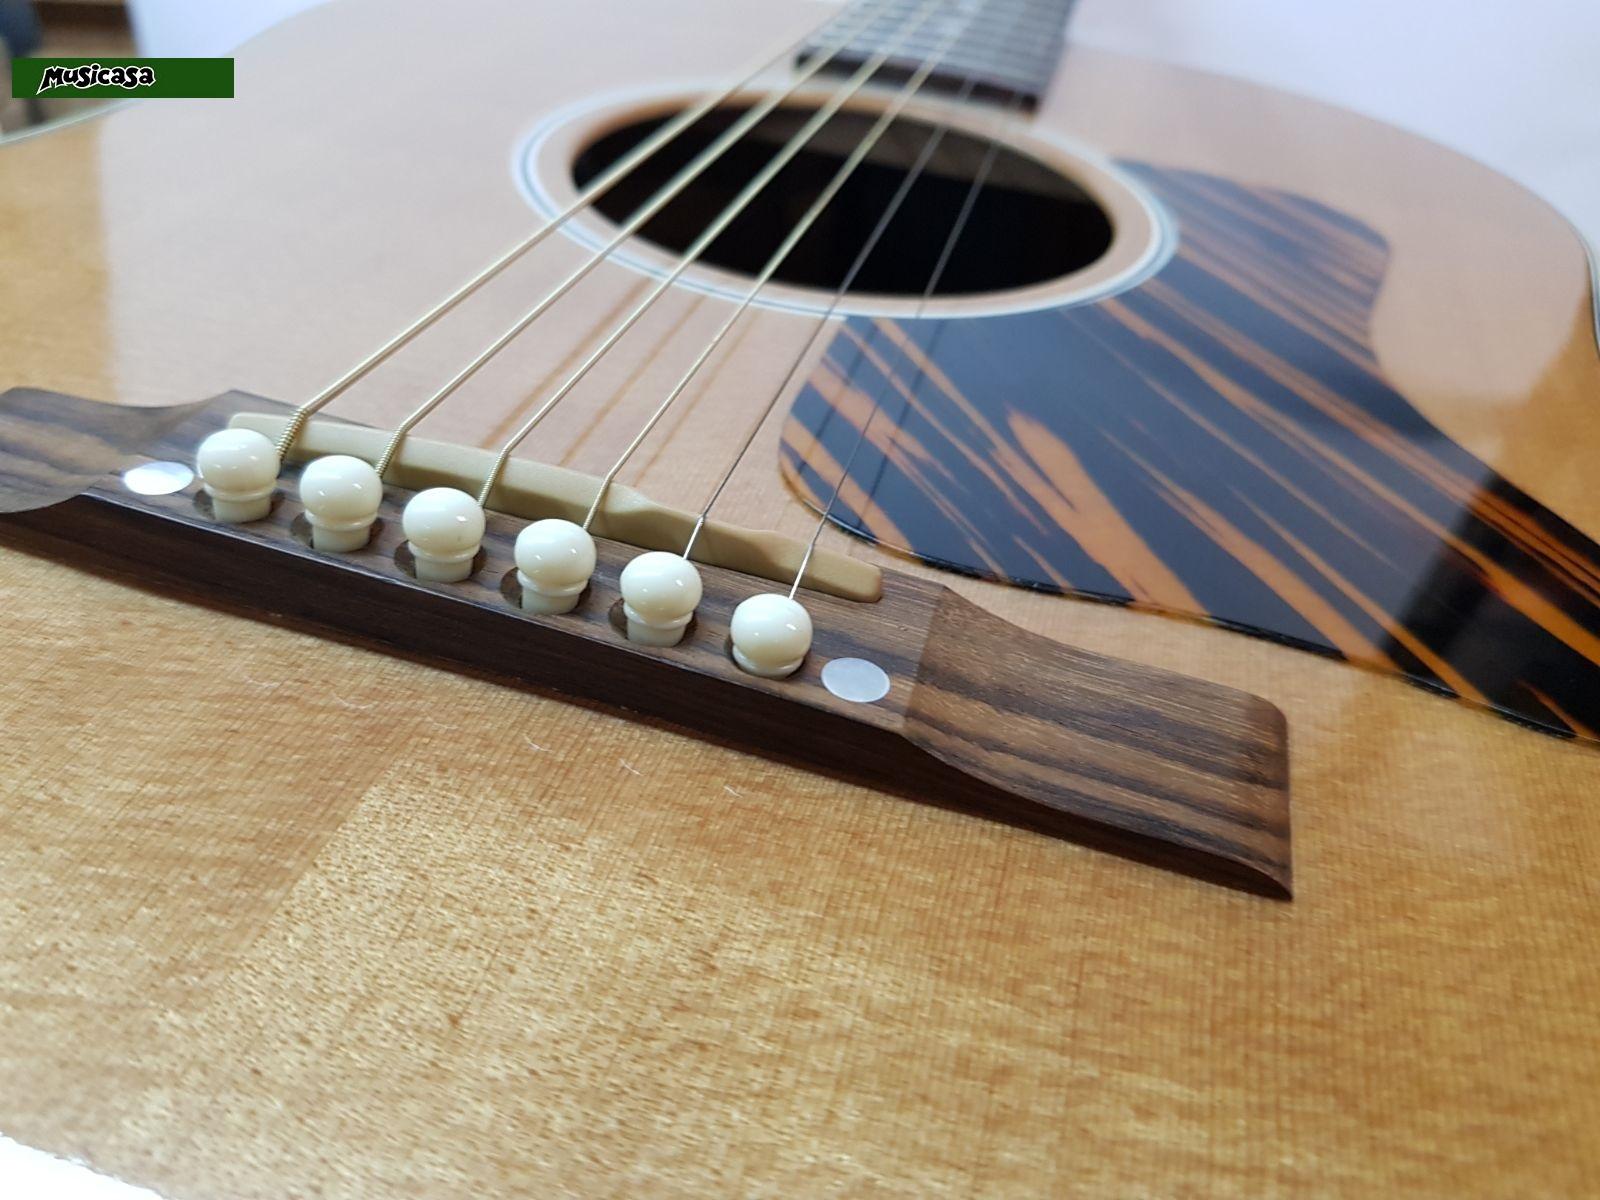 guitarra acustica gibson j 35 dreadnought acoustic guitar con pastilla lrbaggs pickup musicasa. Black Bedroom Furniture Sets. Home Design Ideas